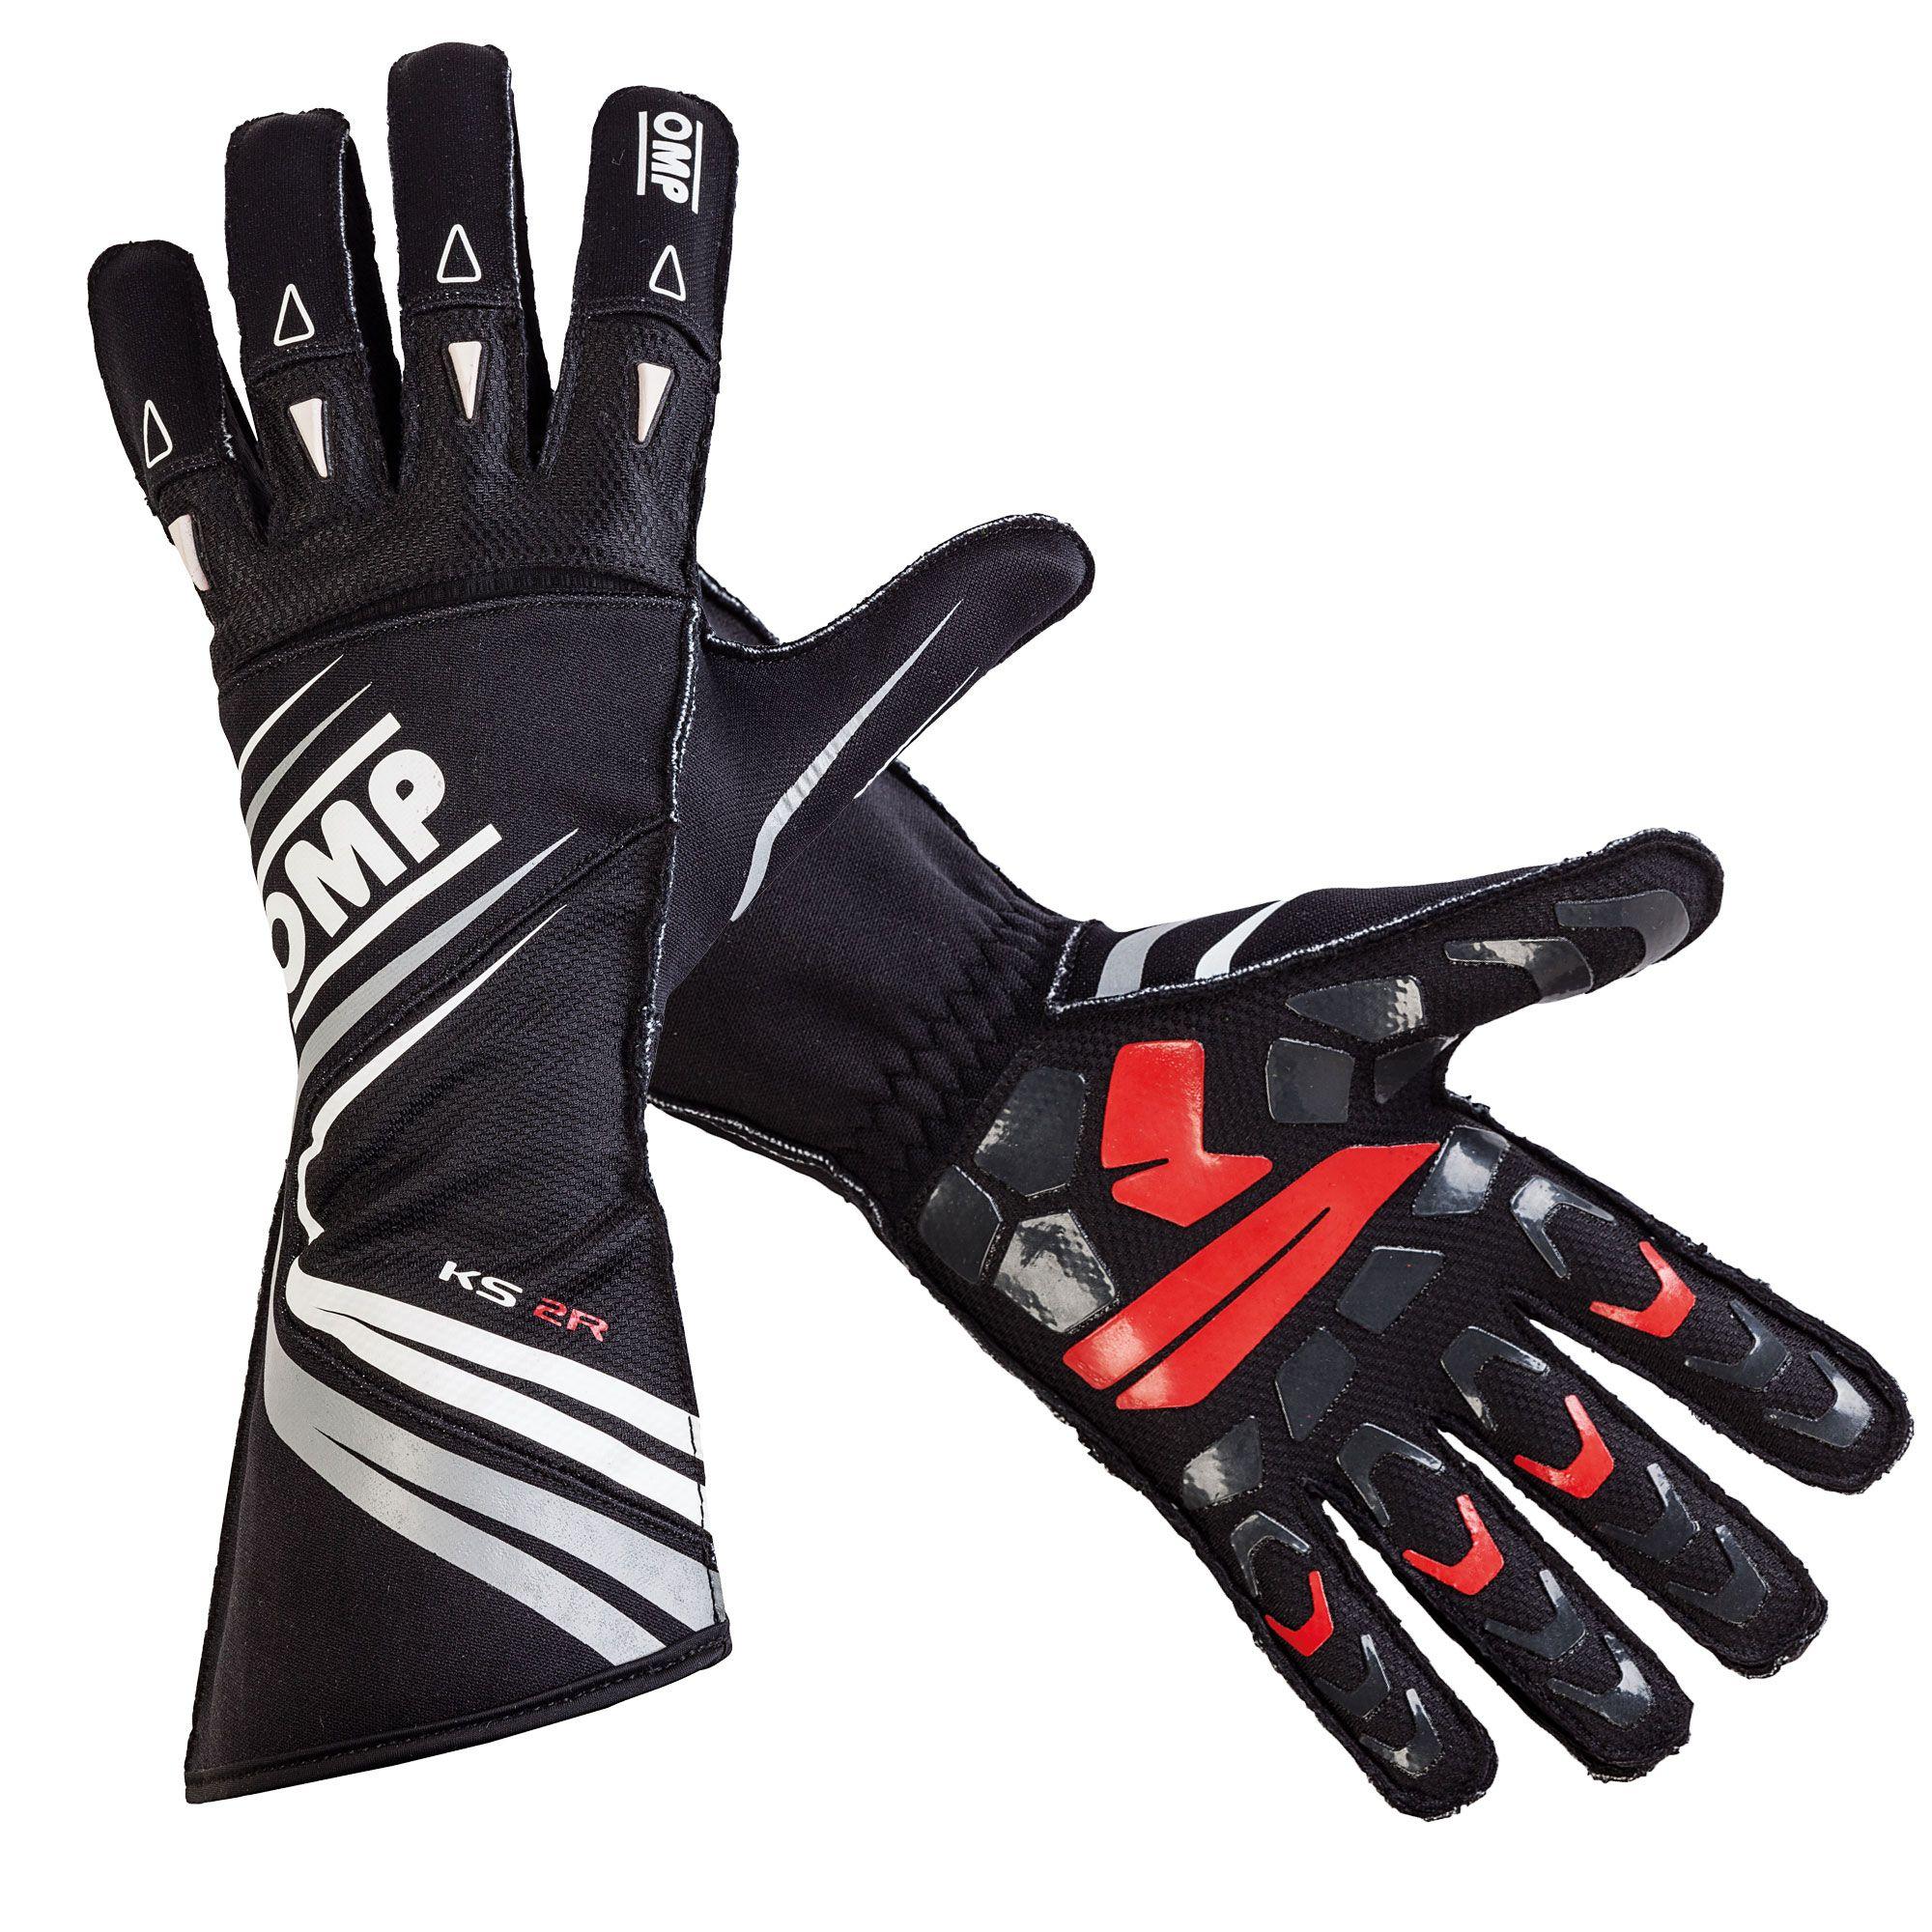 OMP KS-2R Kart Gloves (Kids & Adults) thumbnail